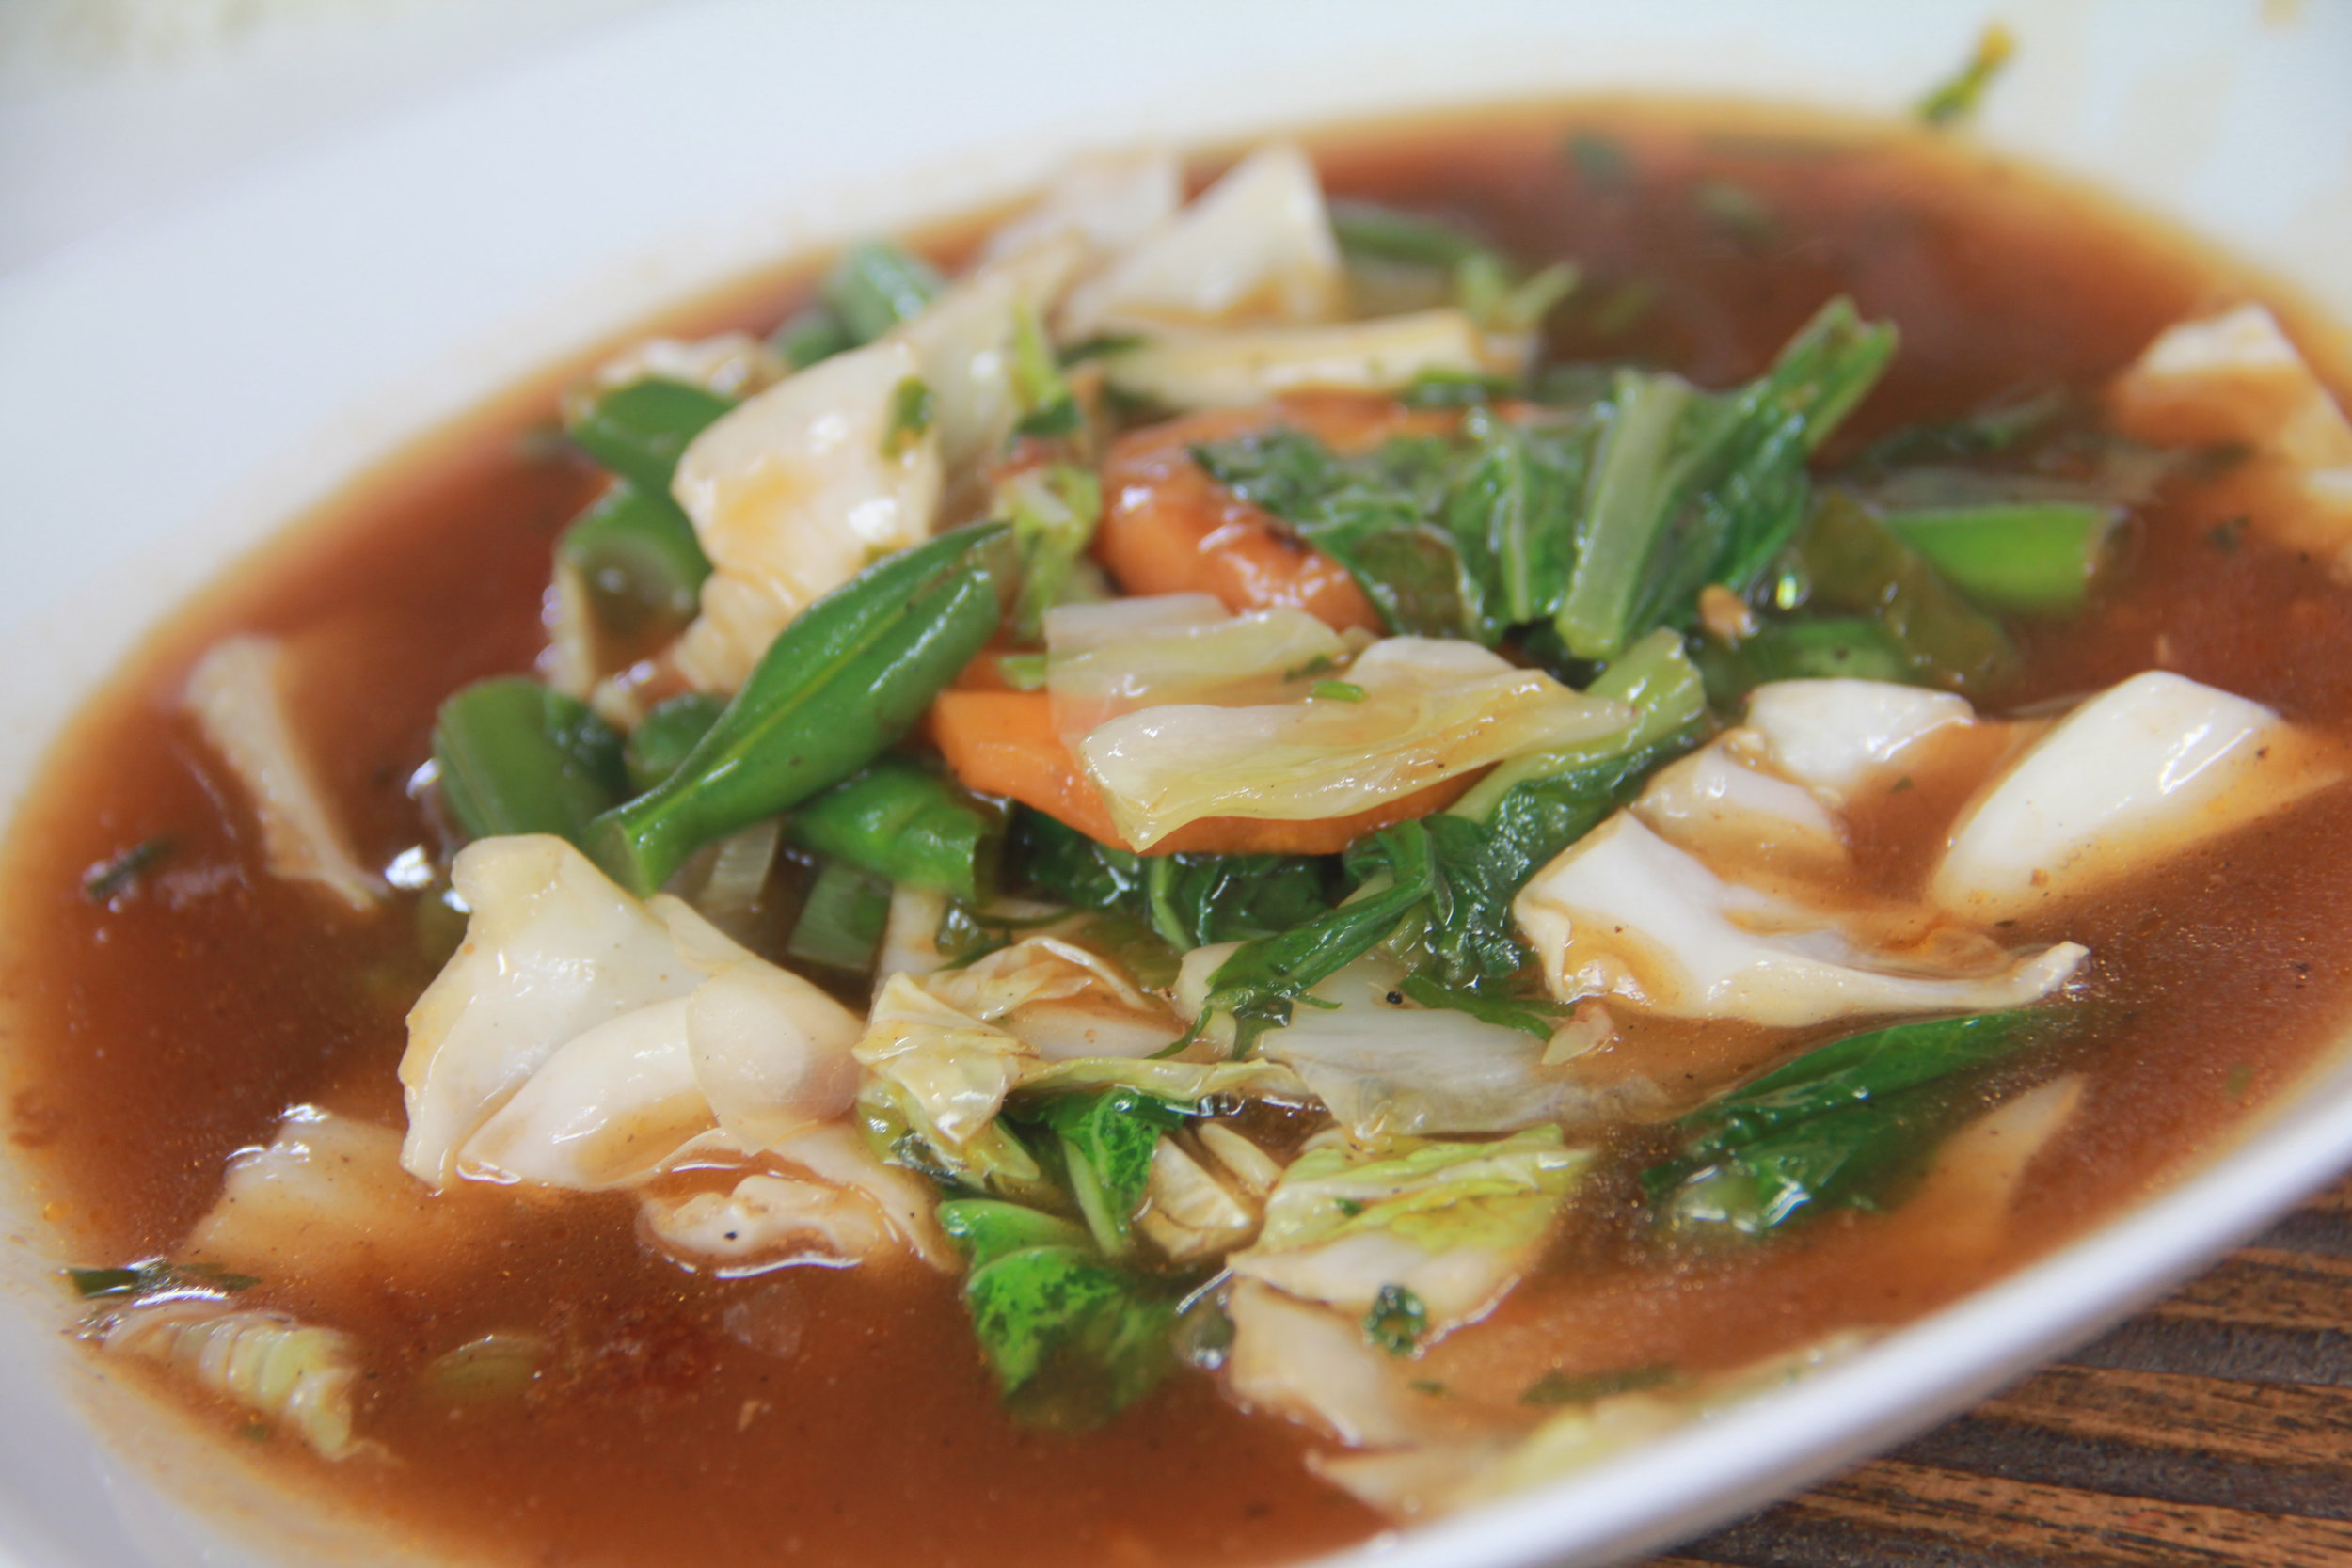 Stir Fried Vegetable Soup (Capcay)